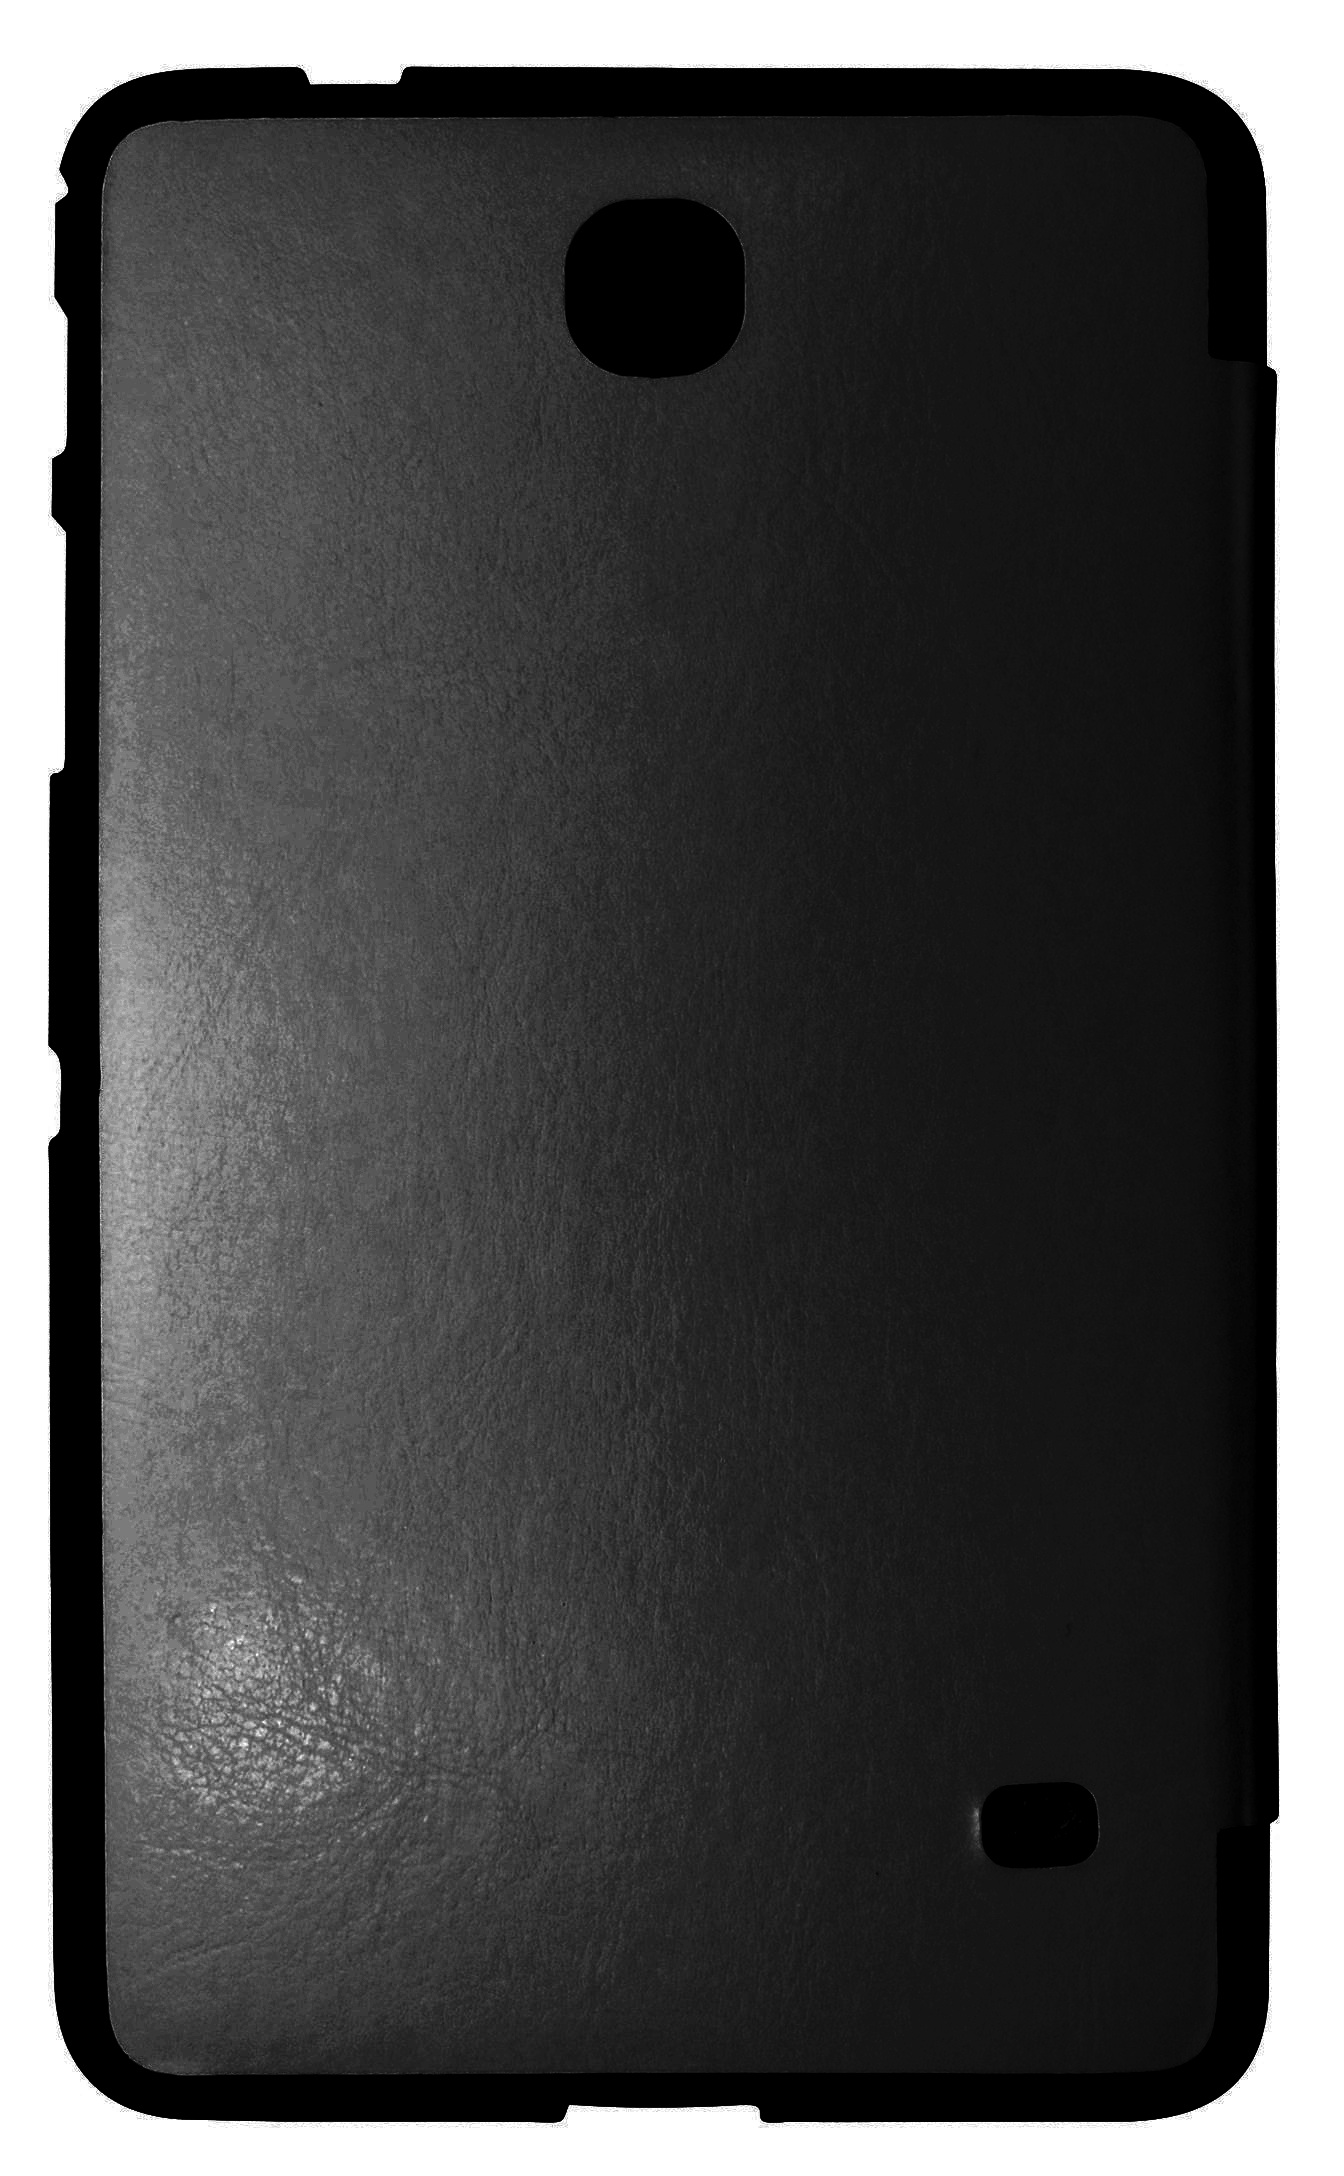 Husa tip carte neagra cu stand pentru Samsung Galaxy Tab 4 8.0 (SM-T330), Tab 4 8.0 LTE (SM-T335)